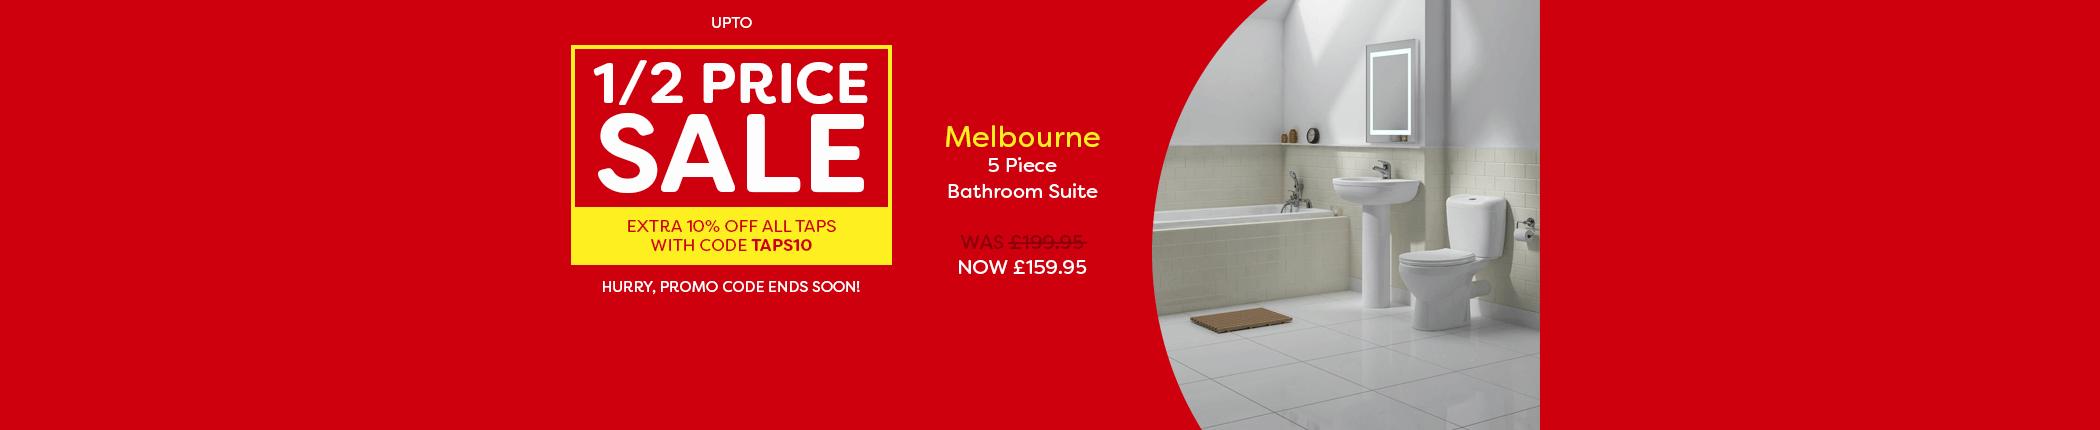 half-price-sale-extra-10-off-taps-melbourne-5-piece-bathroom-suite-countdown-apr17-hbnr